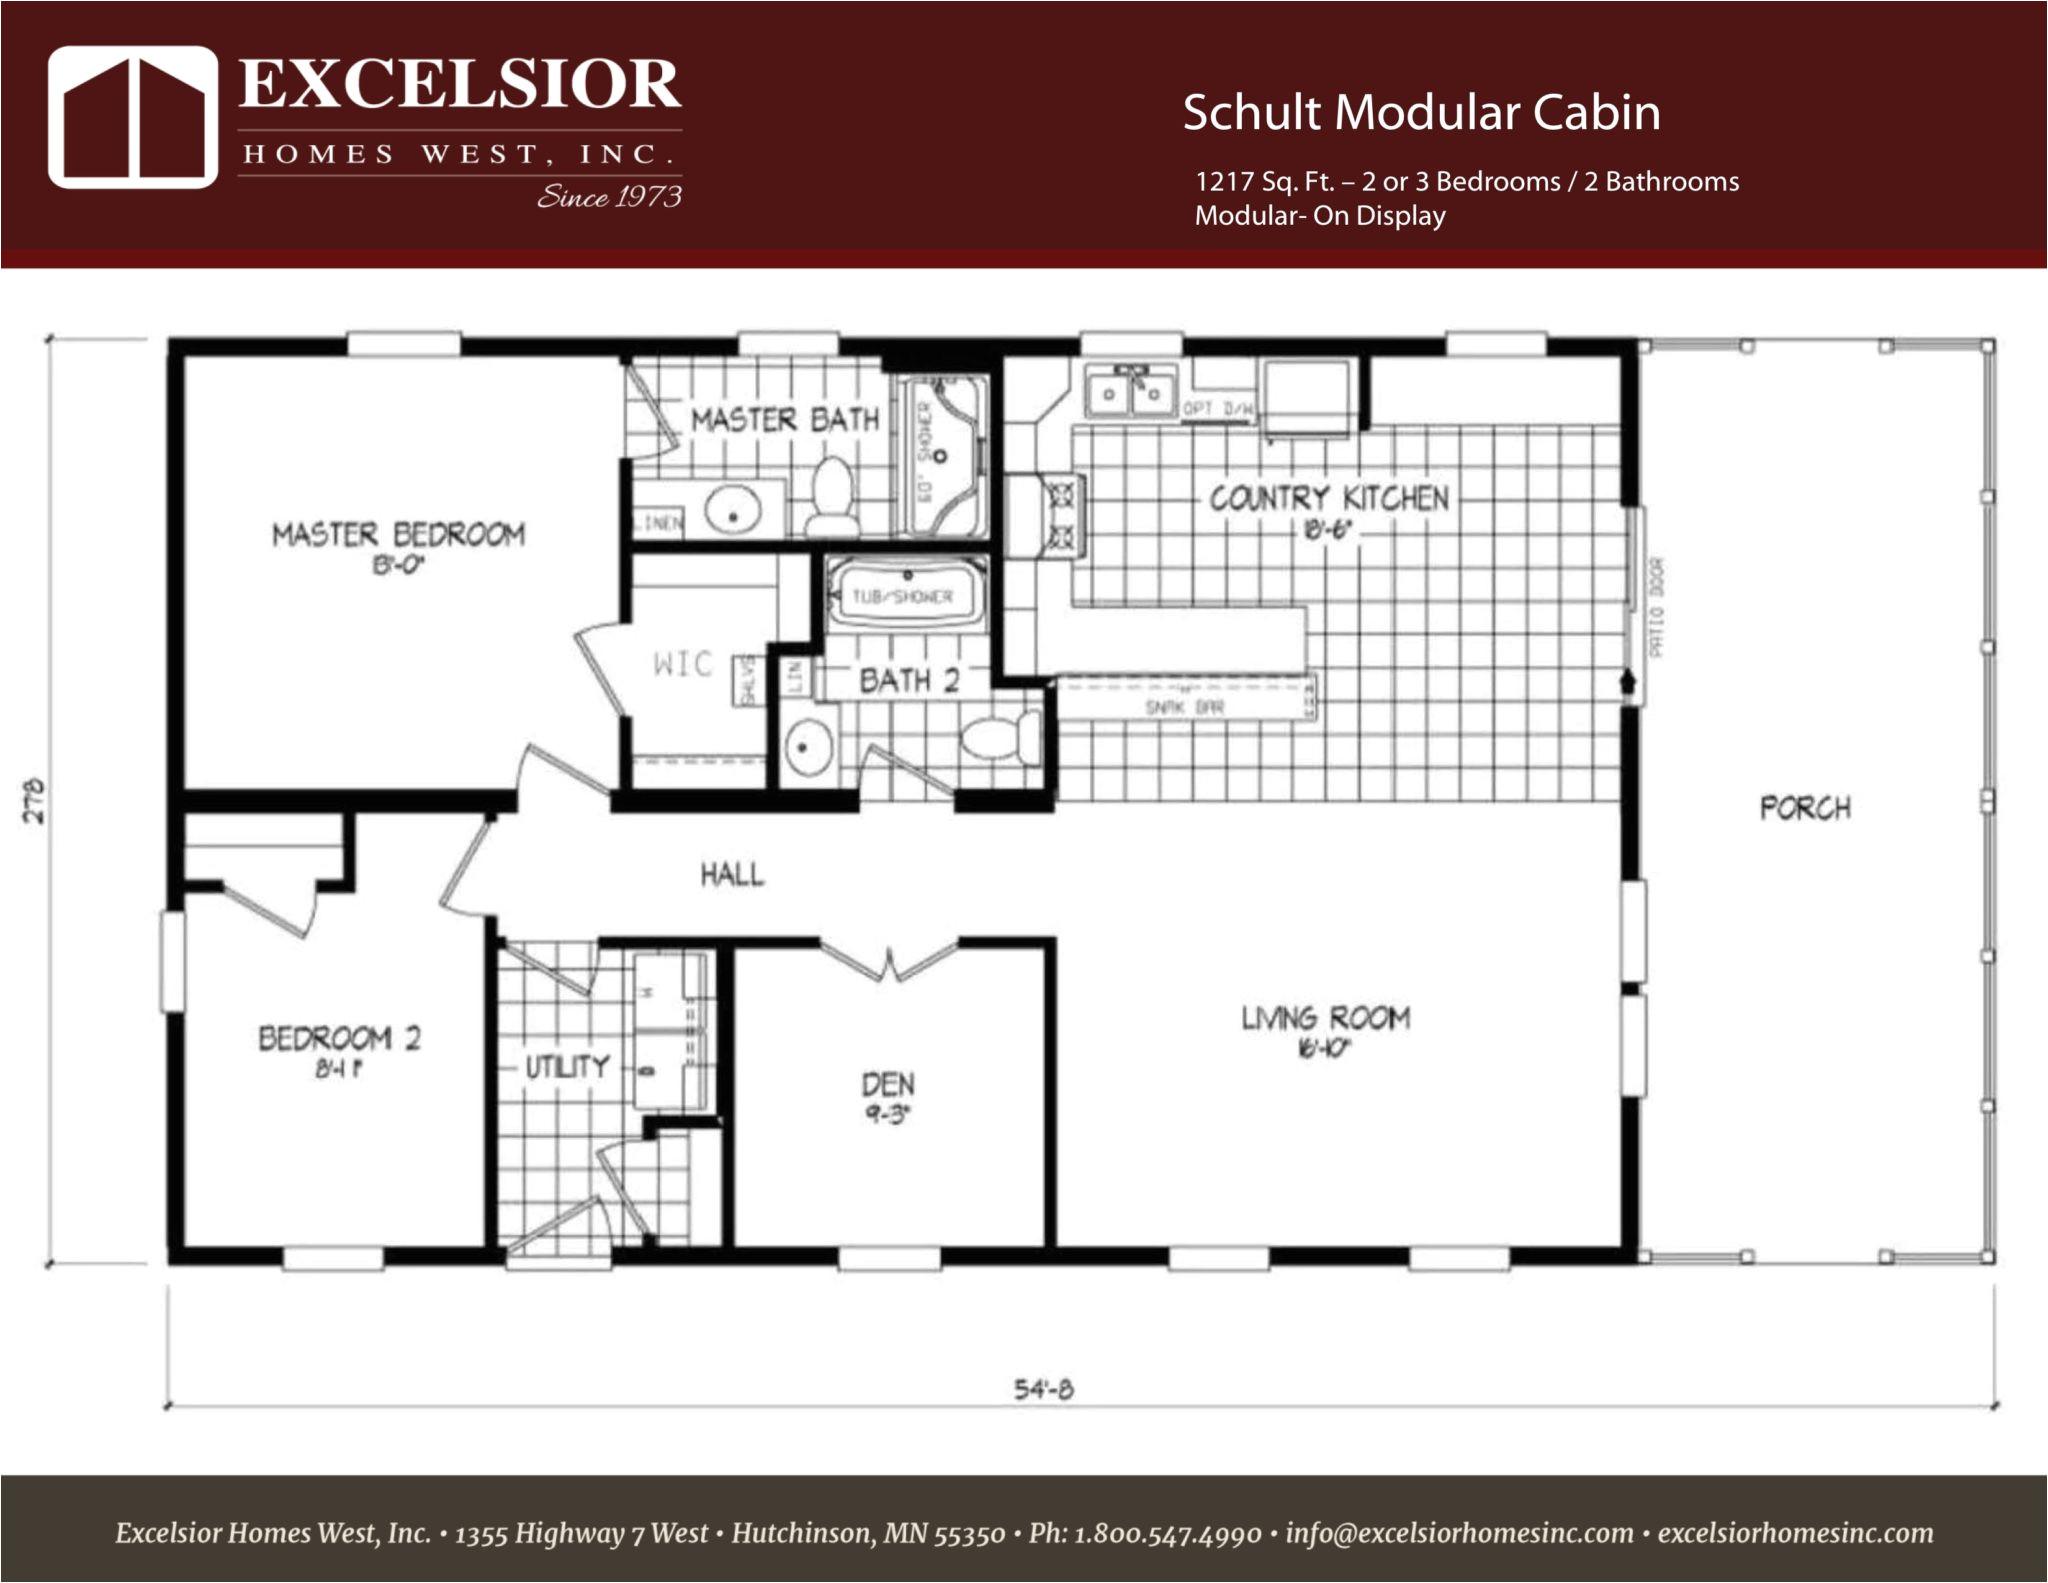 Modular Homes Floor Plan Schult Modular Cabin Excelsior Homes West Inc